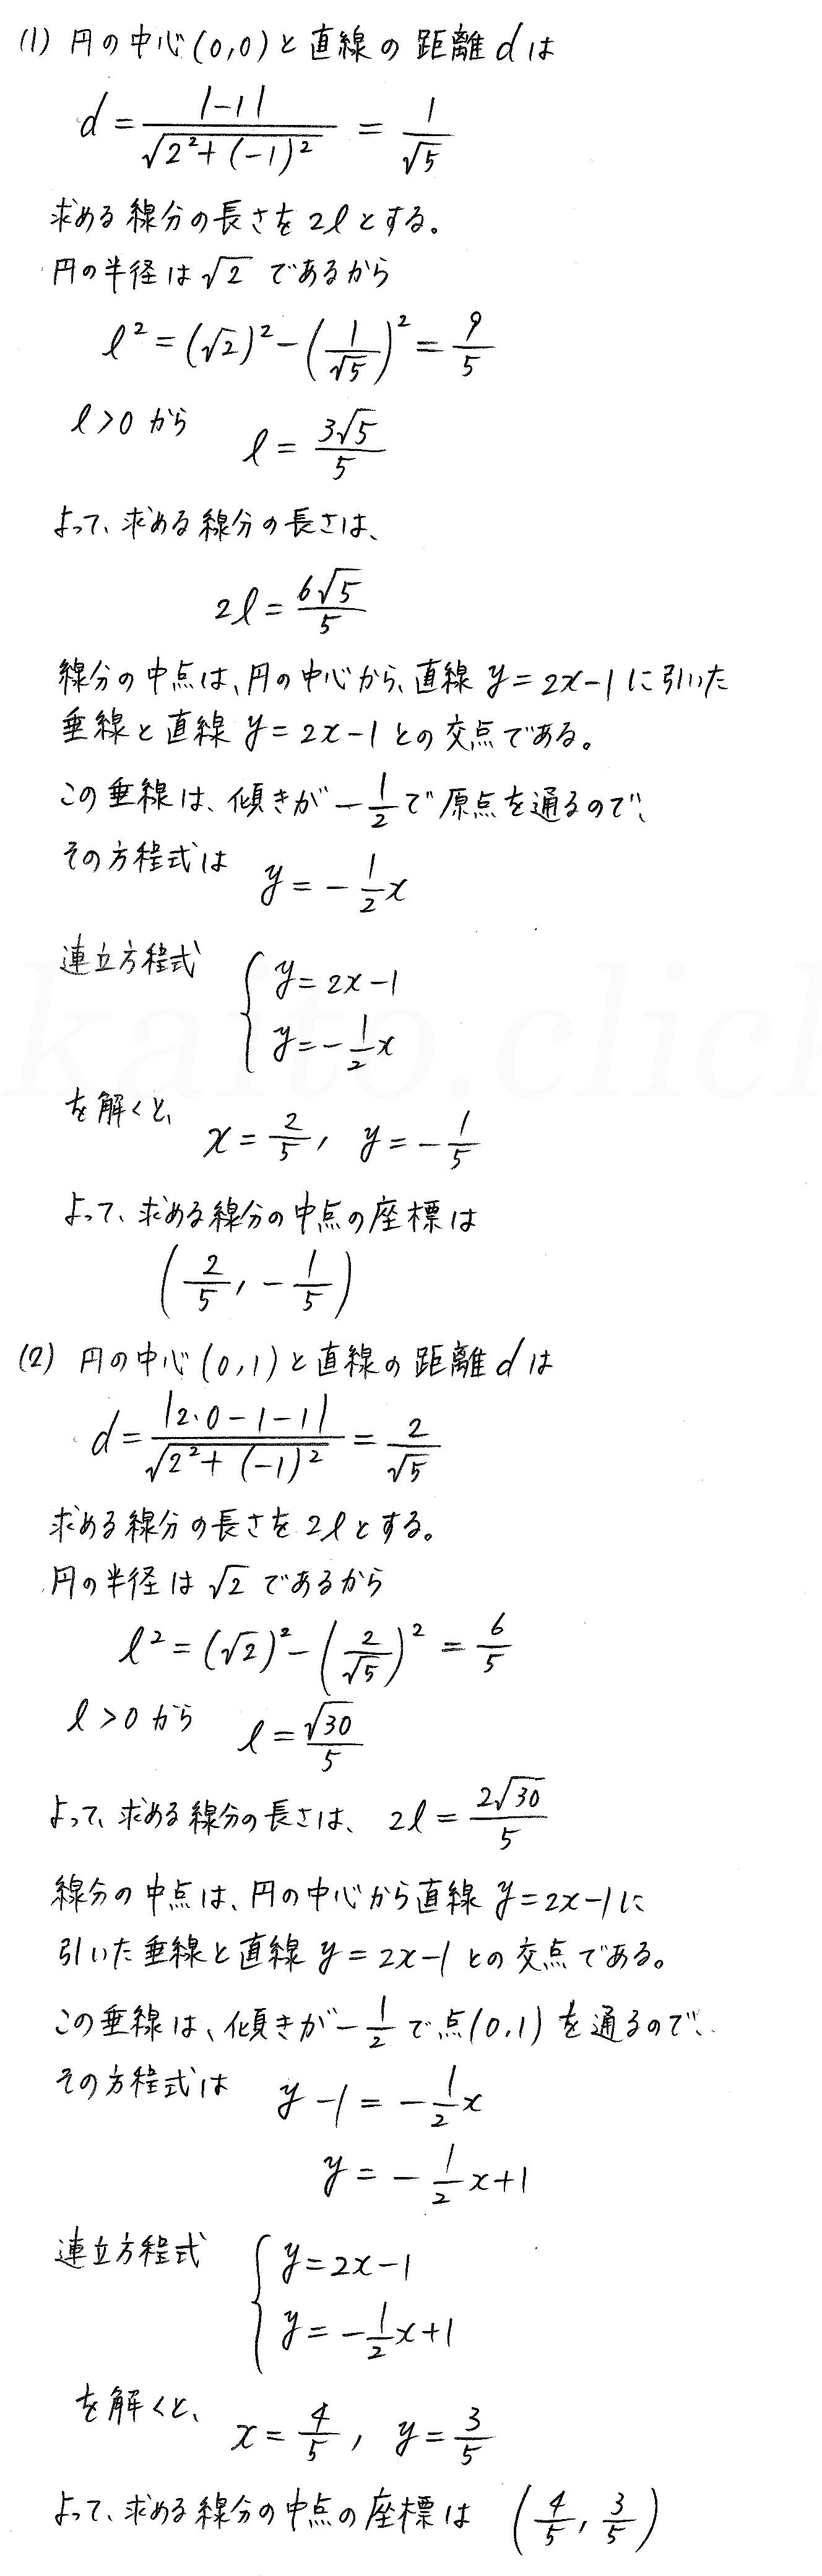 3TRIAL数学2-191解答